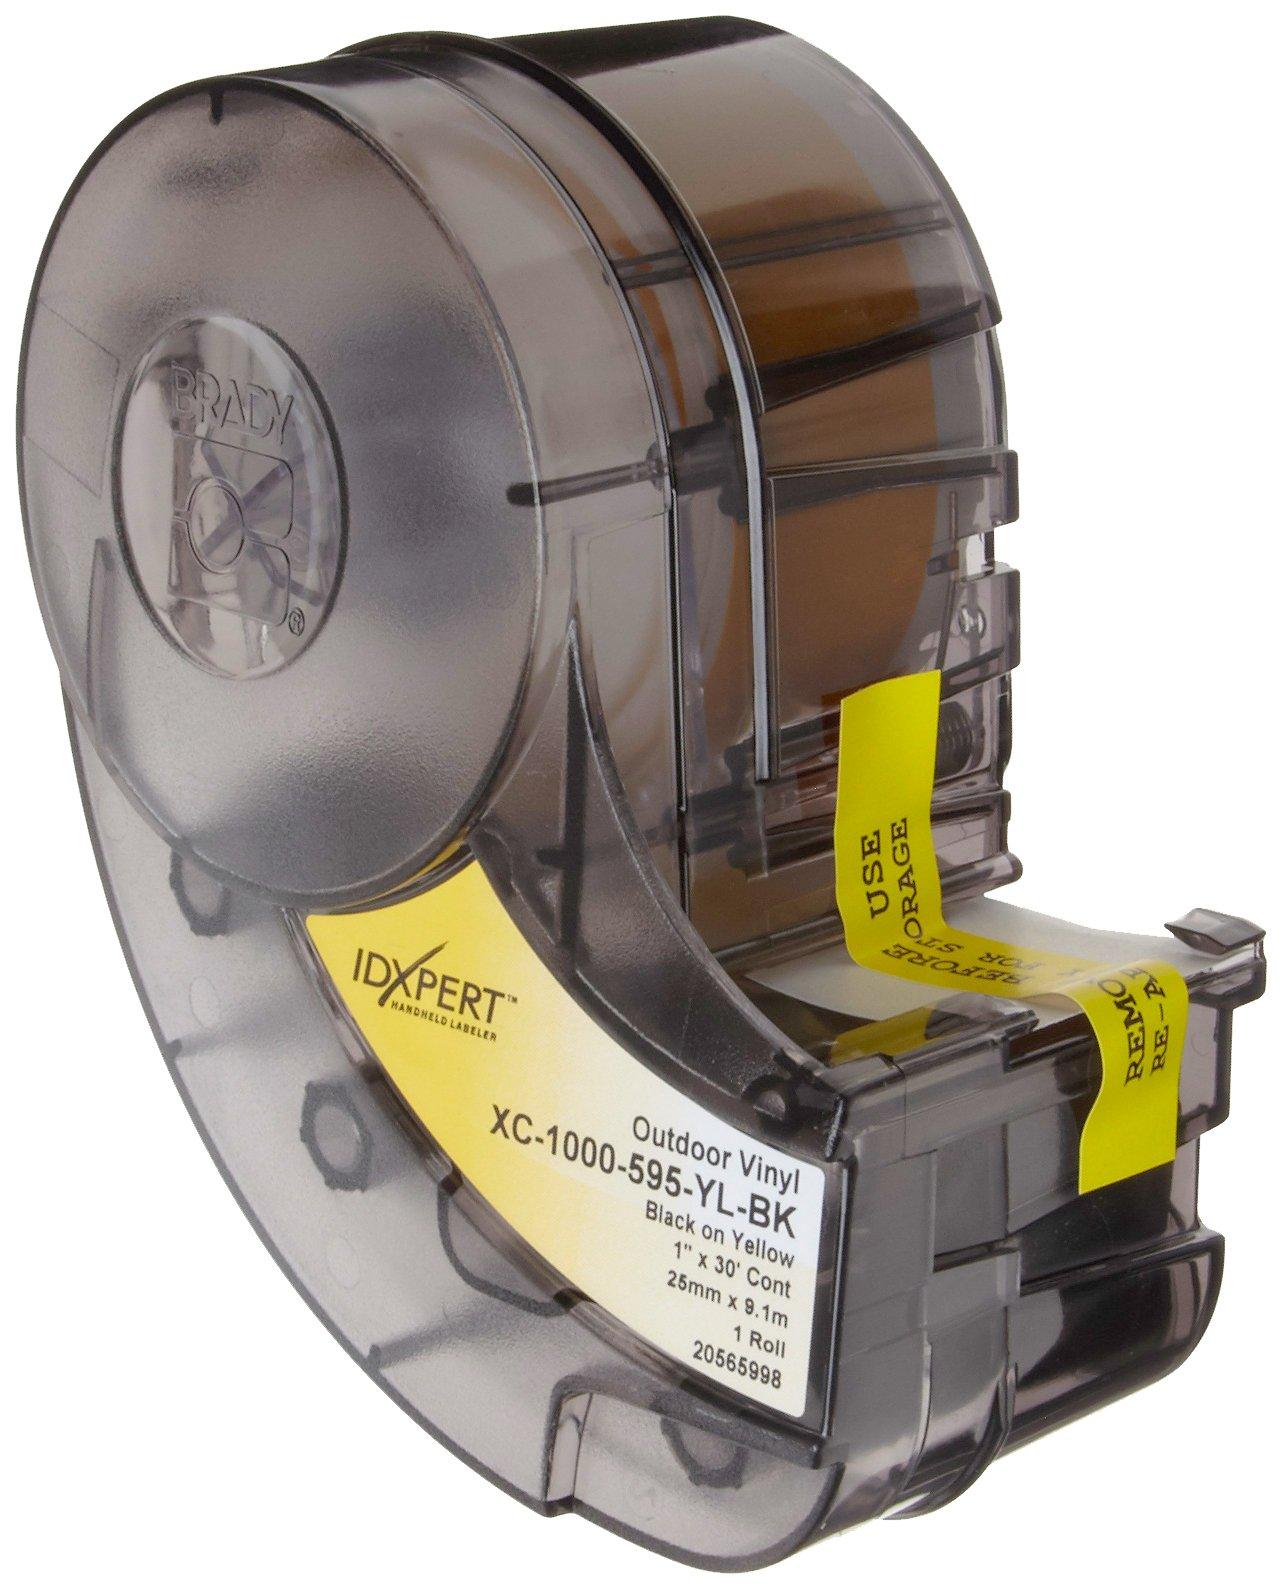 Brady XC-1000-595-YL-BK IDXPERT(TM) & LABXPERT(TM) Labels  B- 595 Indoor/Outdoor Vinyl Film Black on Yellow, Printable Area: 19.000'' W x 1.000'' H 1 roll (30ft.)/Cartridge